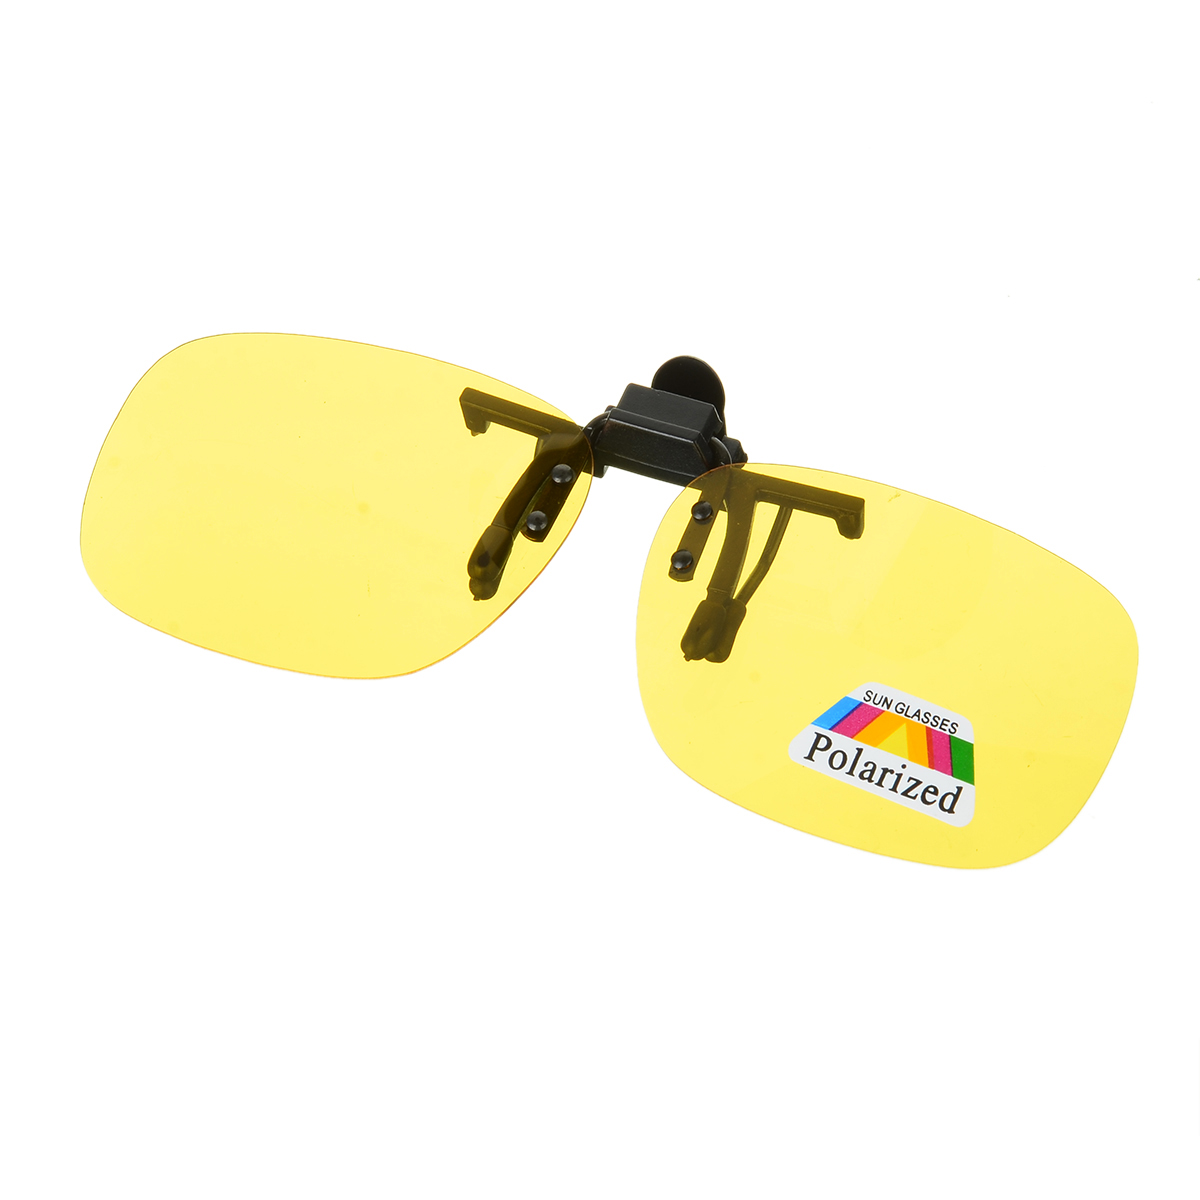 Polarized Clip-on Sunglasses Night Vision Unisex Flip Up Over Prescription Glasses For Driving Fishing Sport Ultra Light